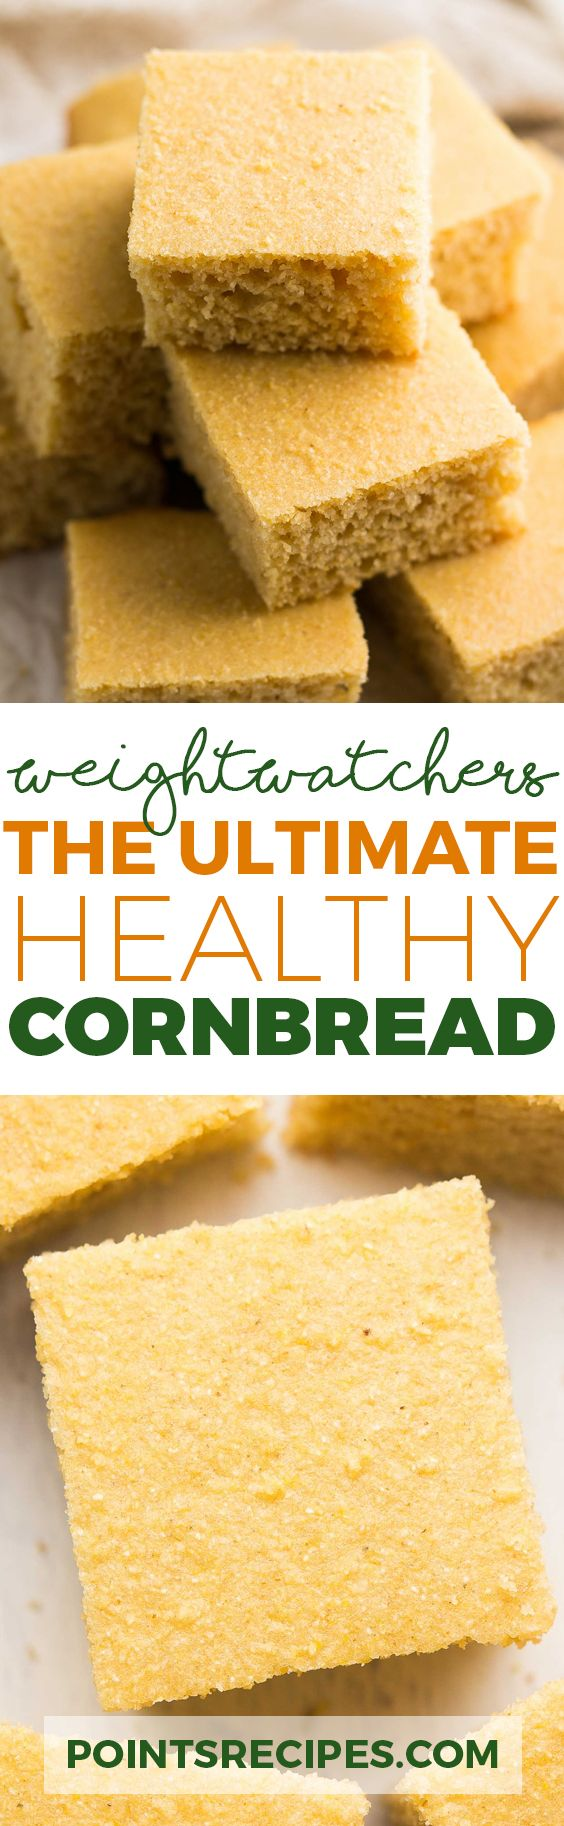 The Ultimate Healthy Cornbread (Weight Watchers SmartPoints)